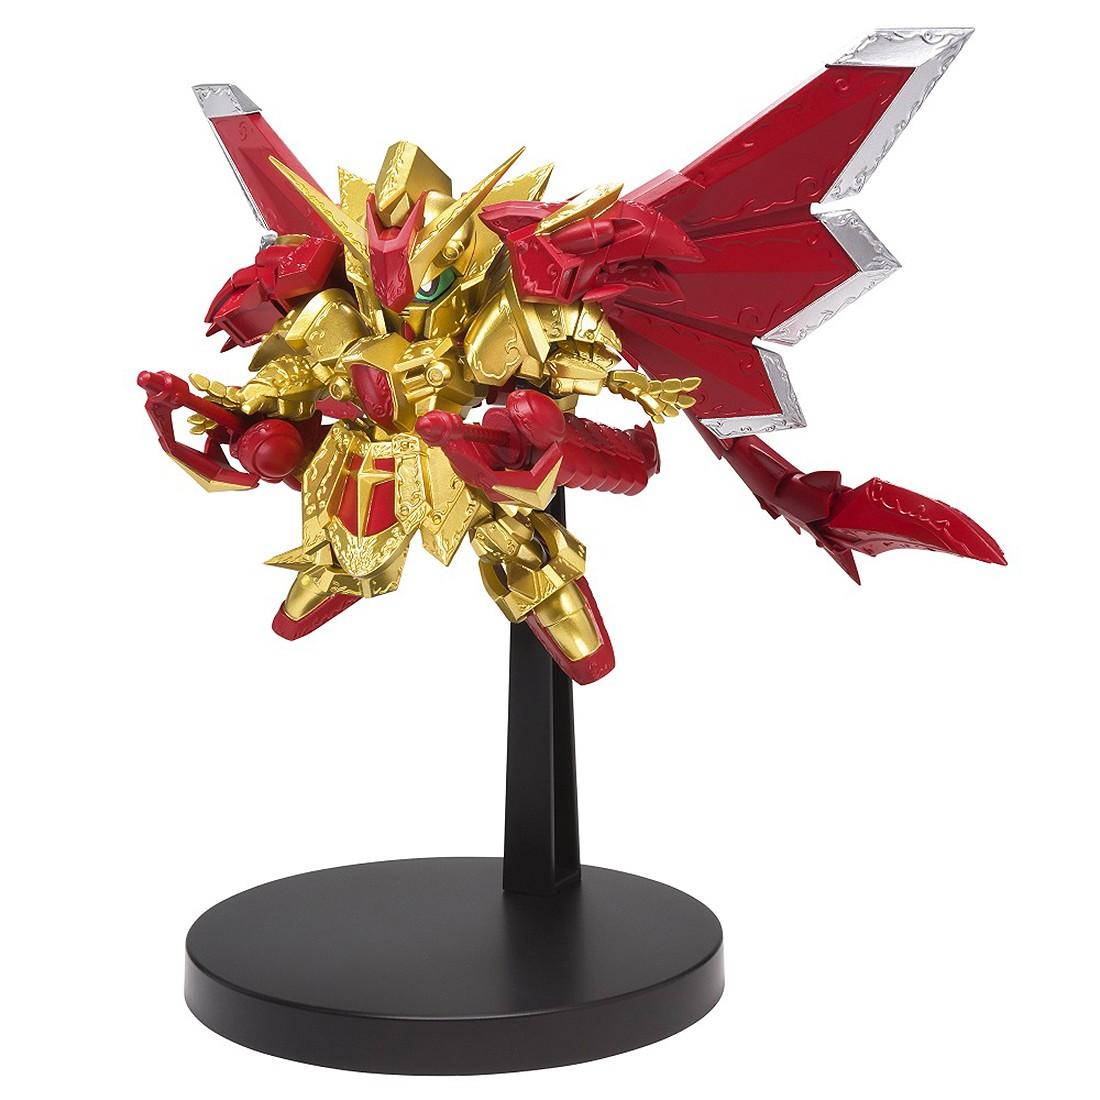 PREORDER - Banpresto SD Gundam World Superior Dragon Figure (gold)